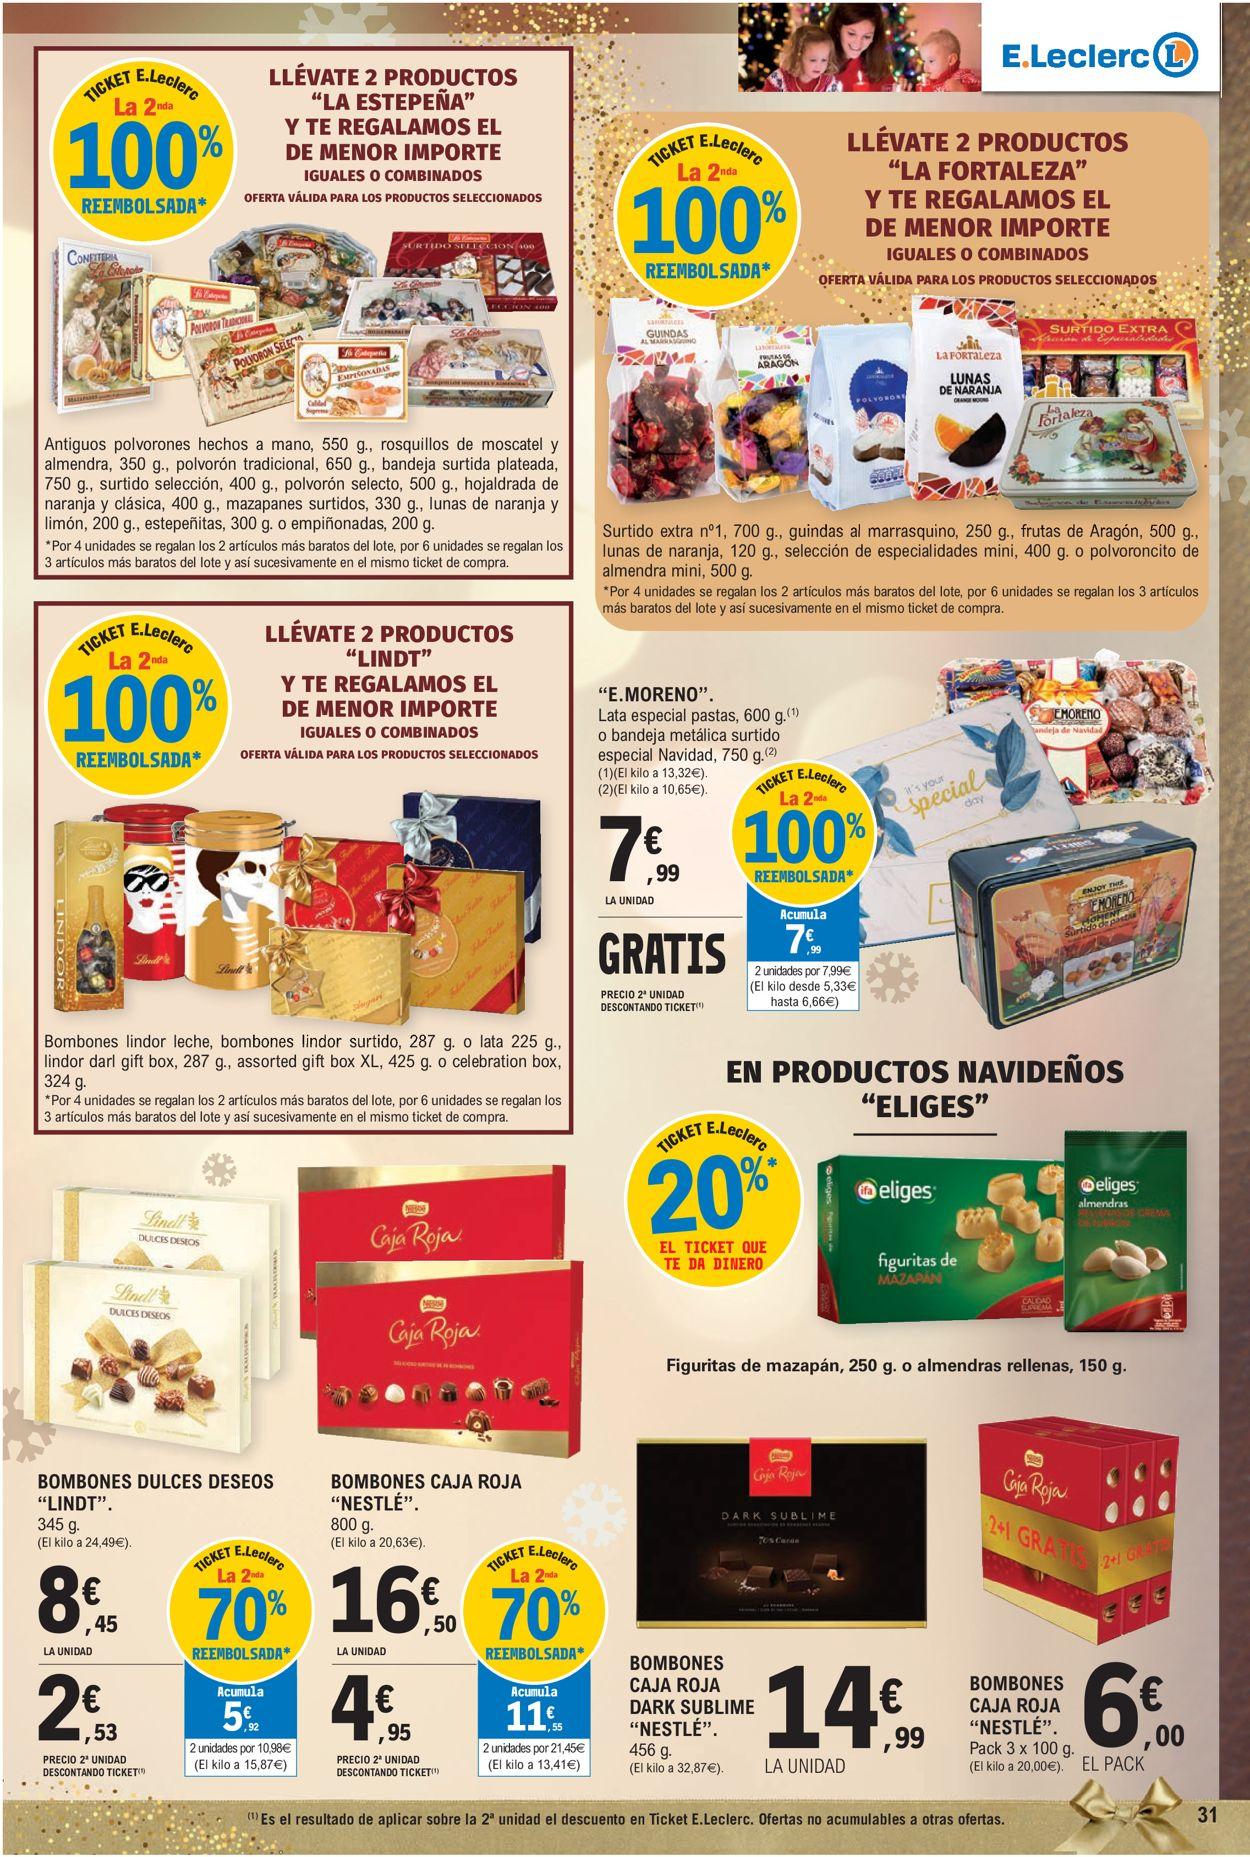 E.leclerc Navidad 2020 Folleto - 09.12-24.12.2020 (Página 31)